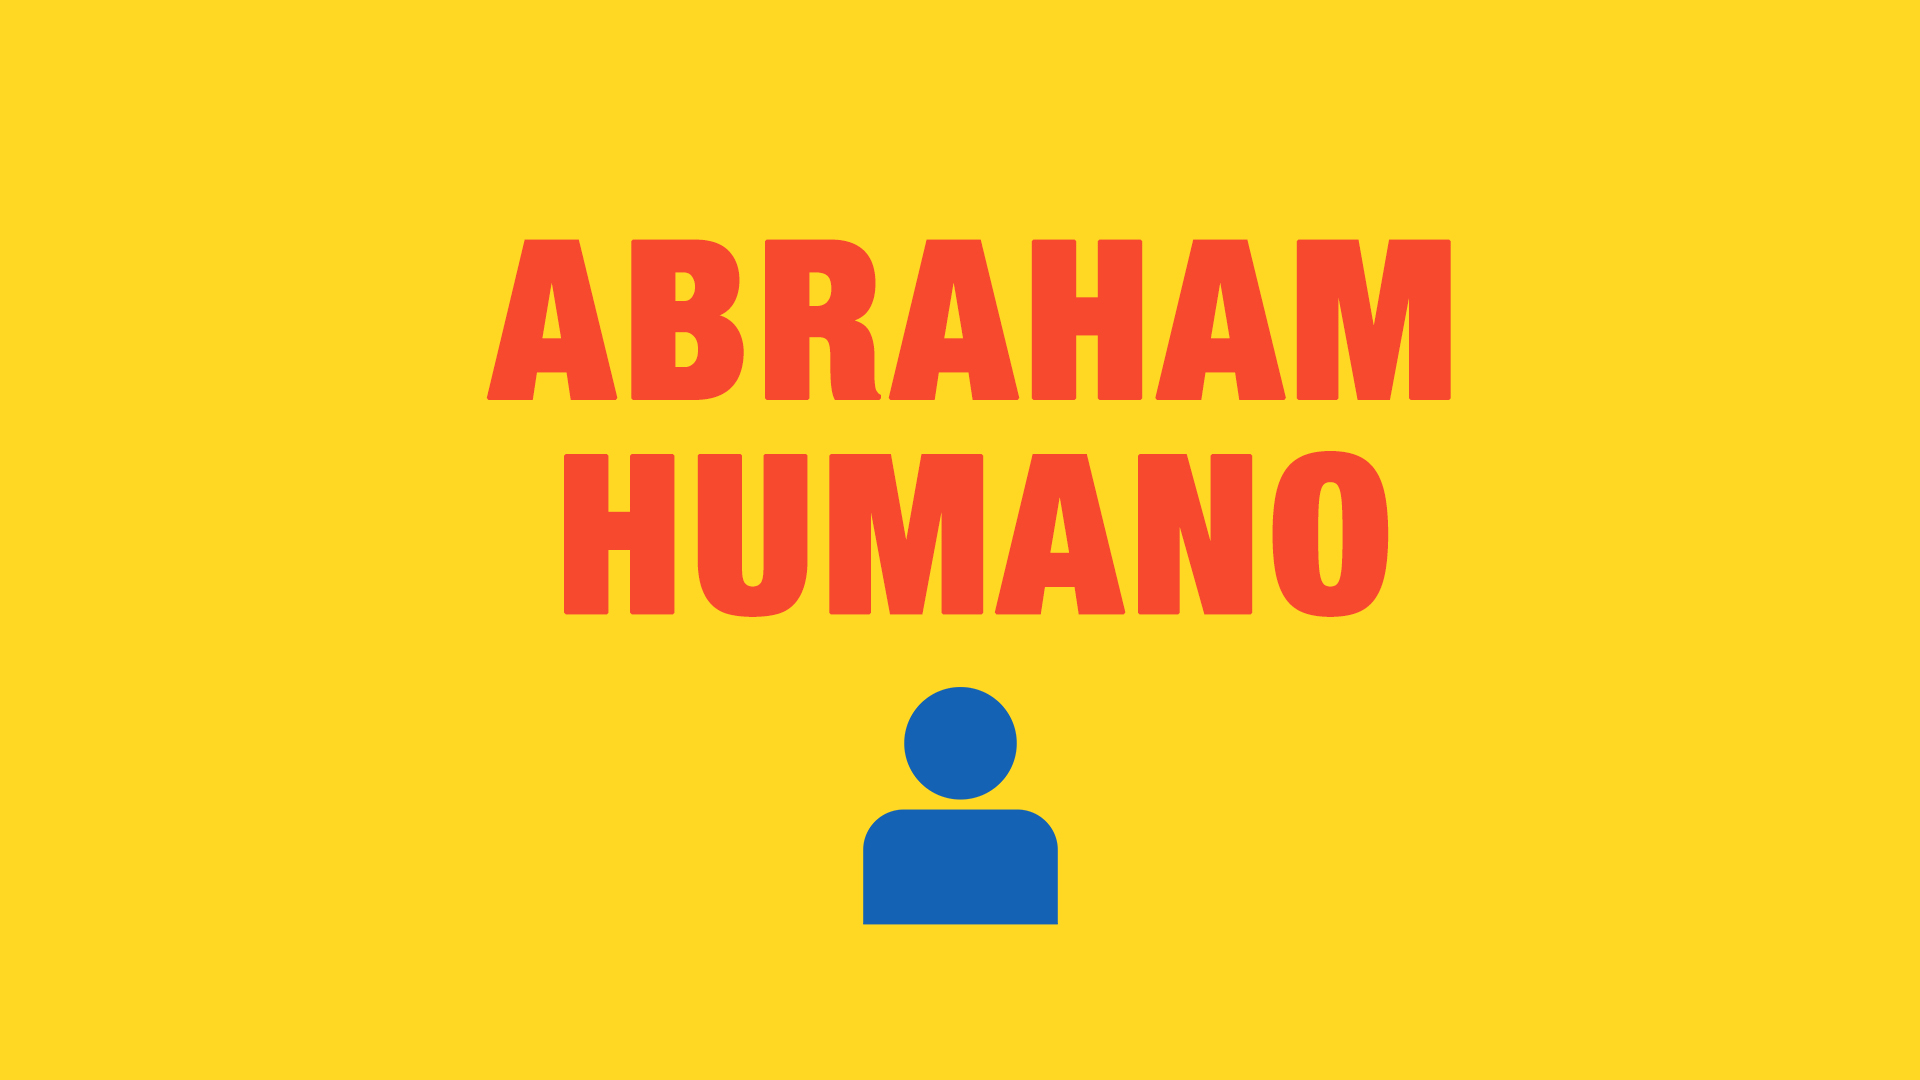 Abraham Humano.jpg